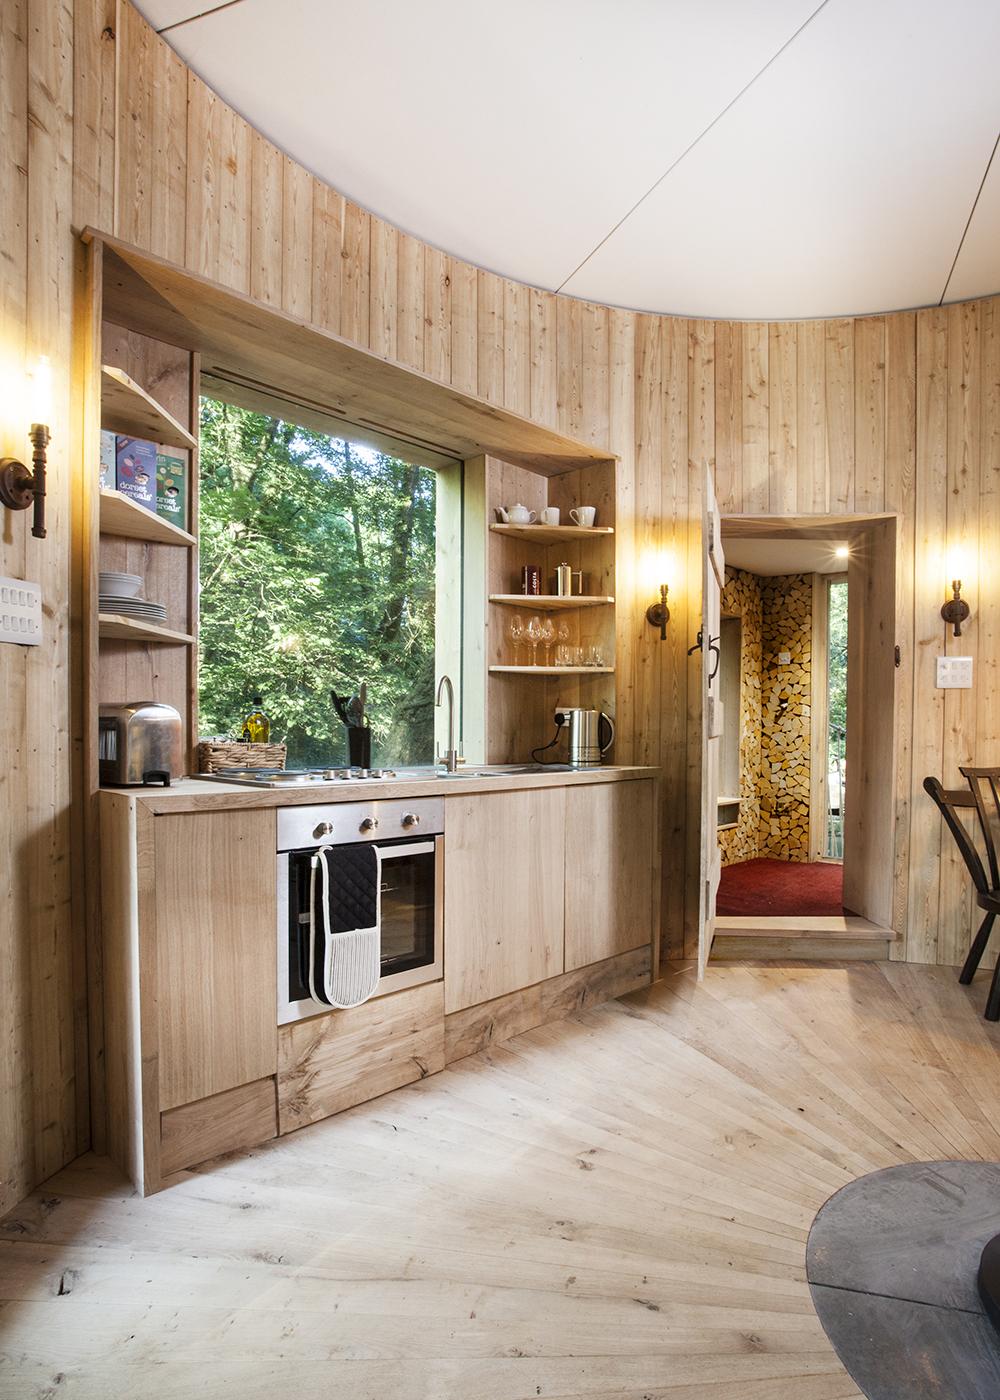 The Woodsman's Treehouse